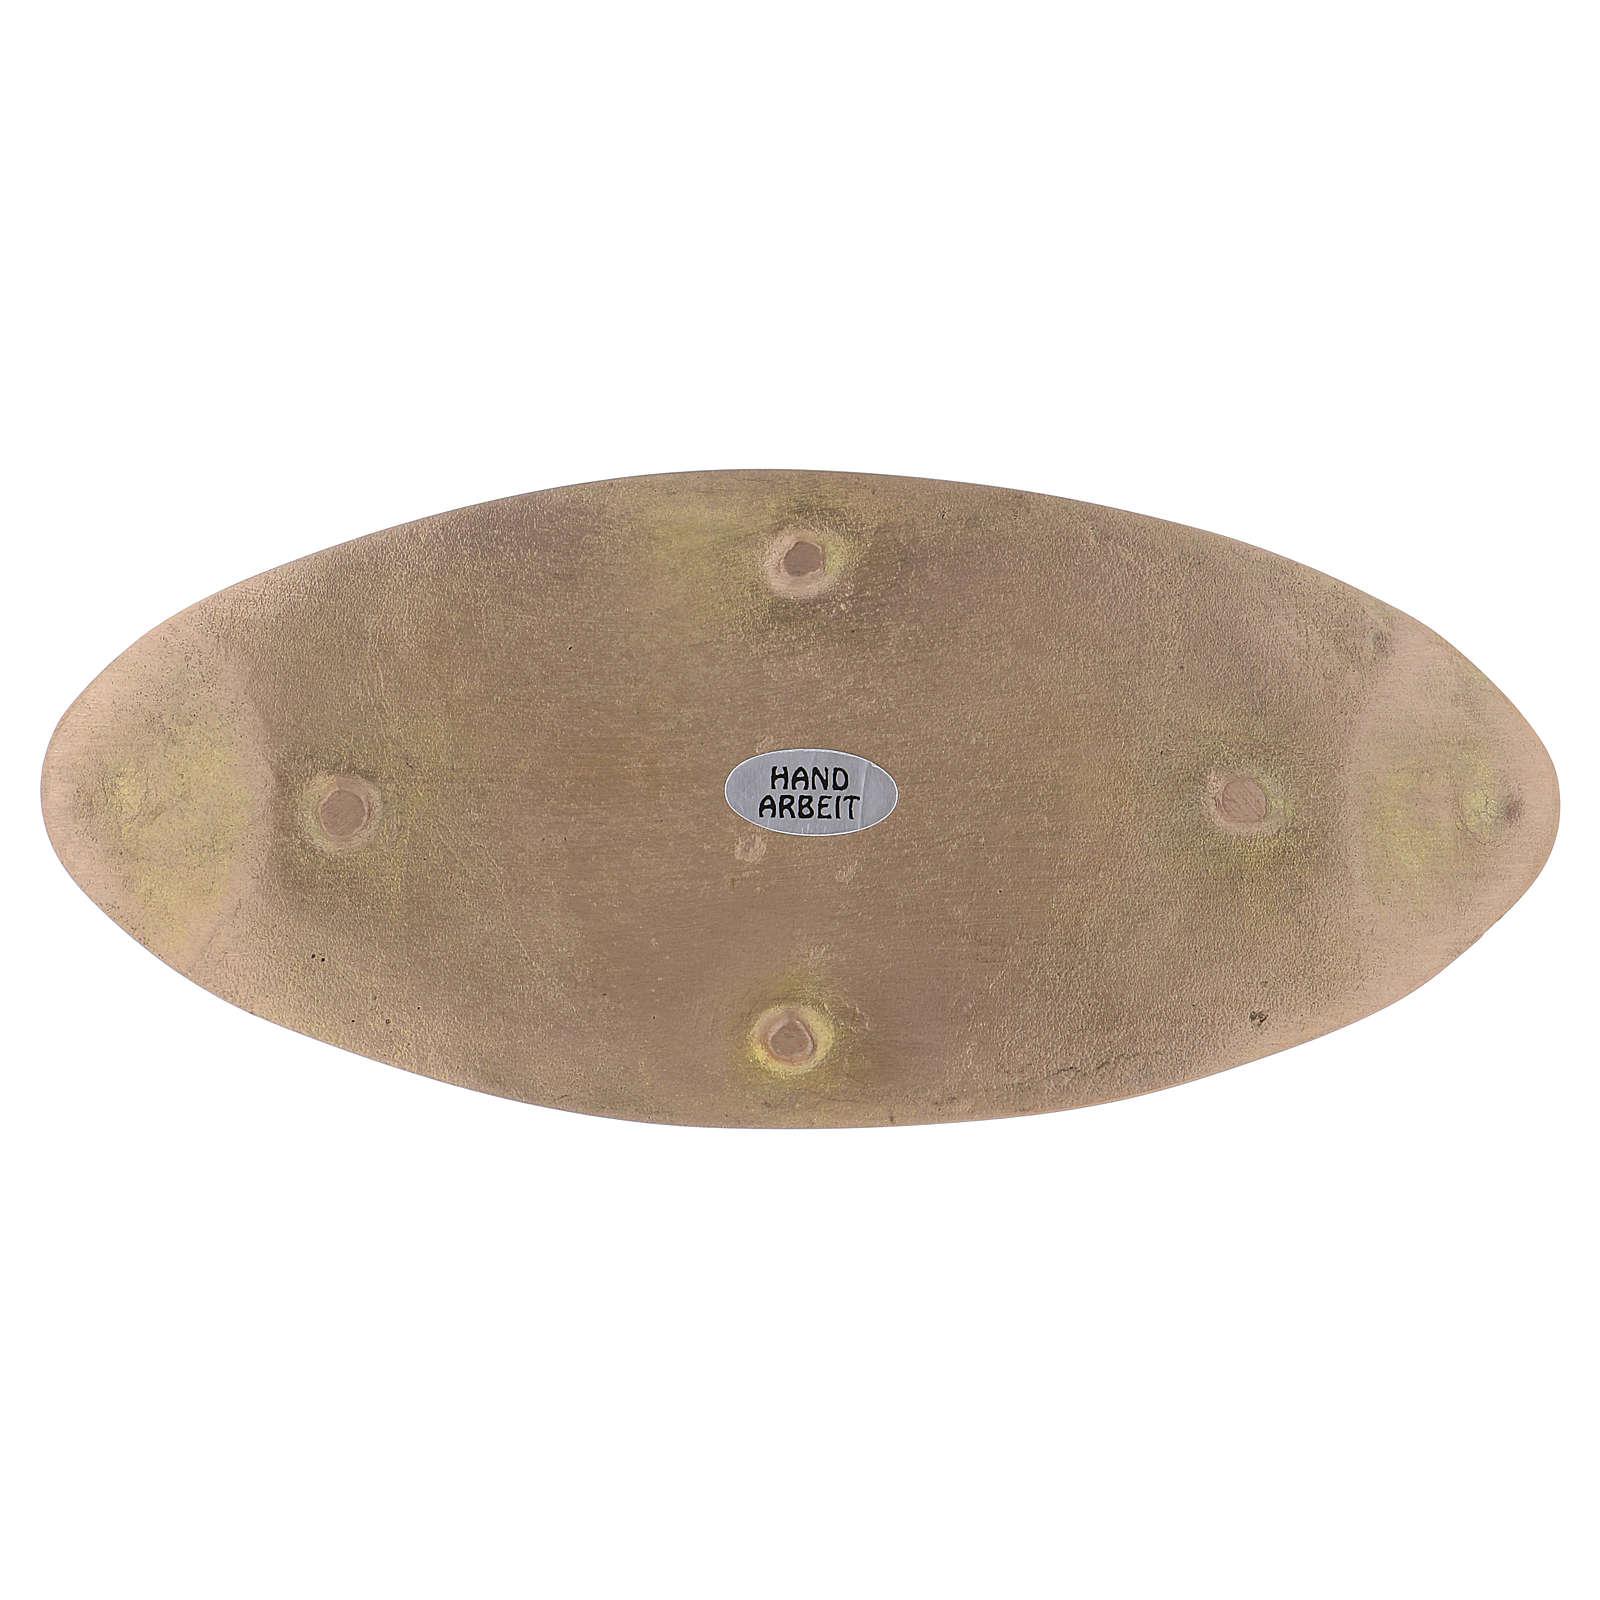 Piatto portacandele ovale ottone opaco 18x7,5 cm  3